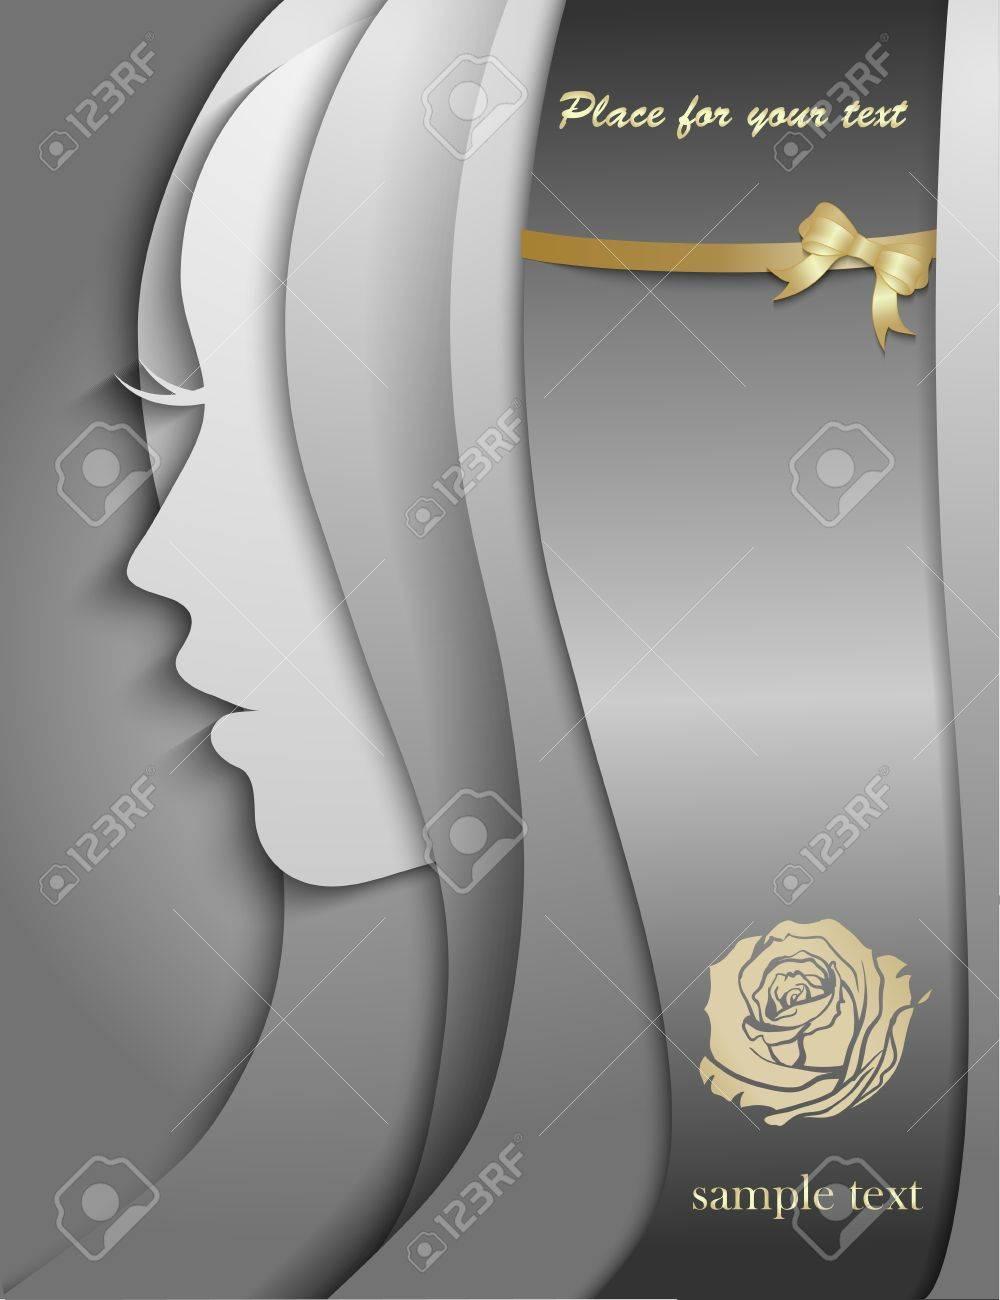 Girl with long hair - 29346858